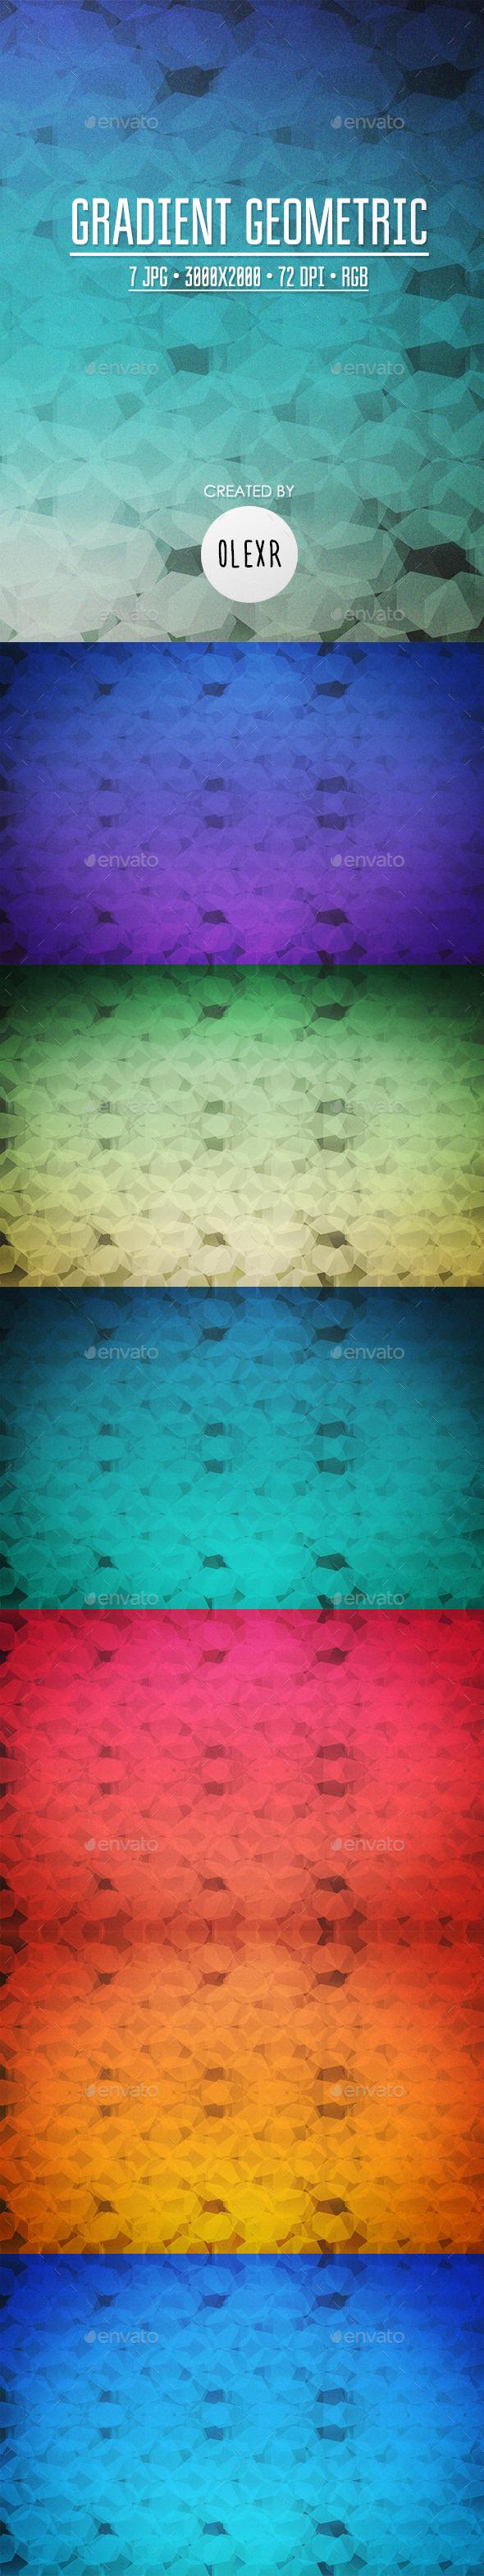 Gradient Geometric Backgrounds